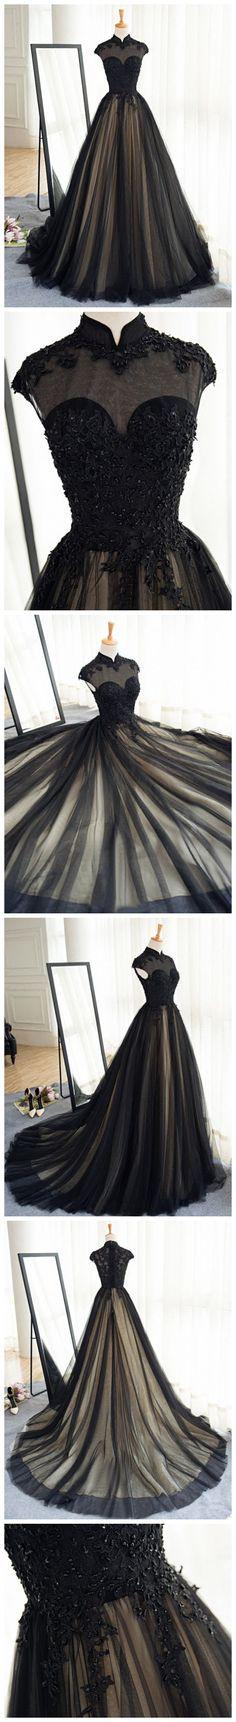 CHIC A-LINE HIGH NECK BLACK TULLE FLOOR LENGTH MODEST PROM DRESS EVENING DRESS AM565